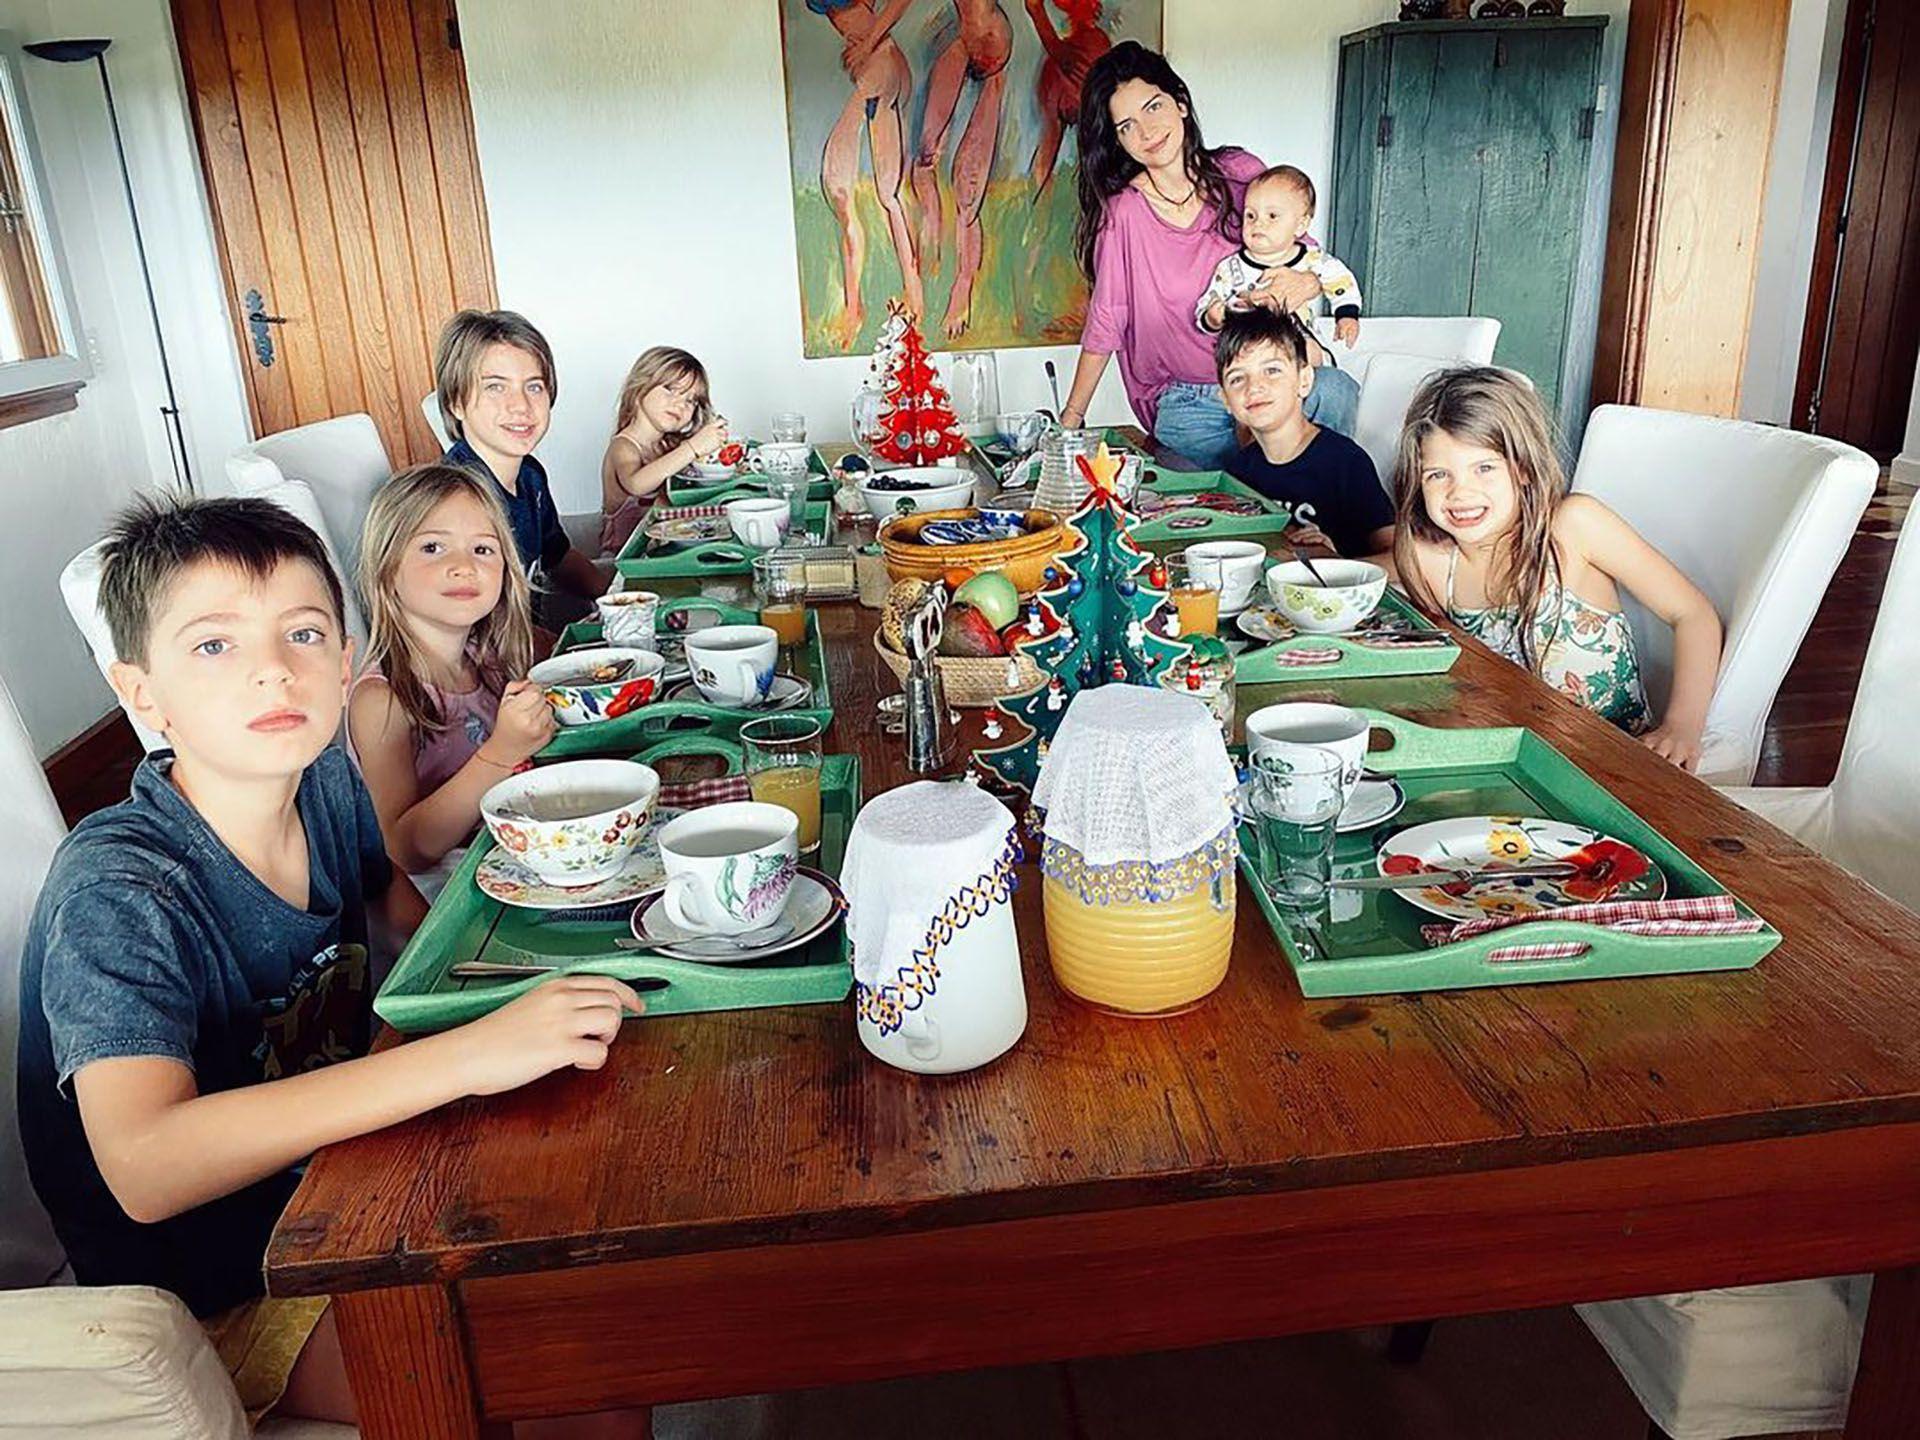 familia wanda nara zaira nara mauro icardi